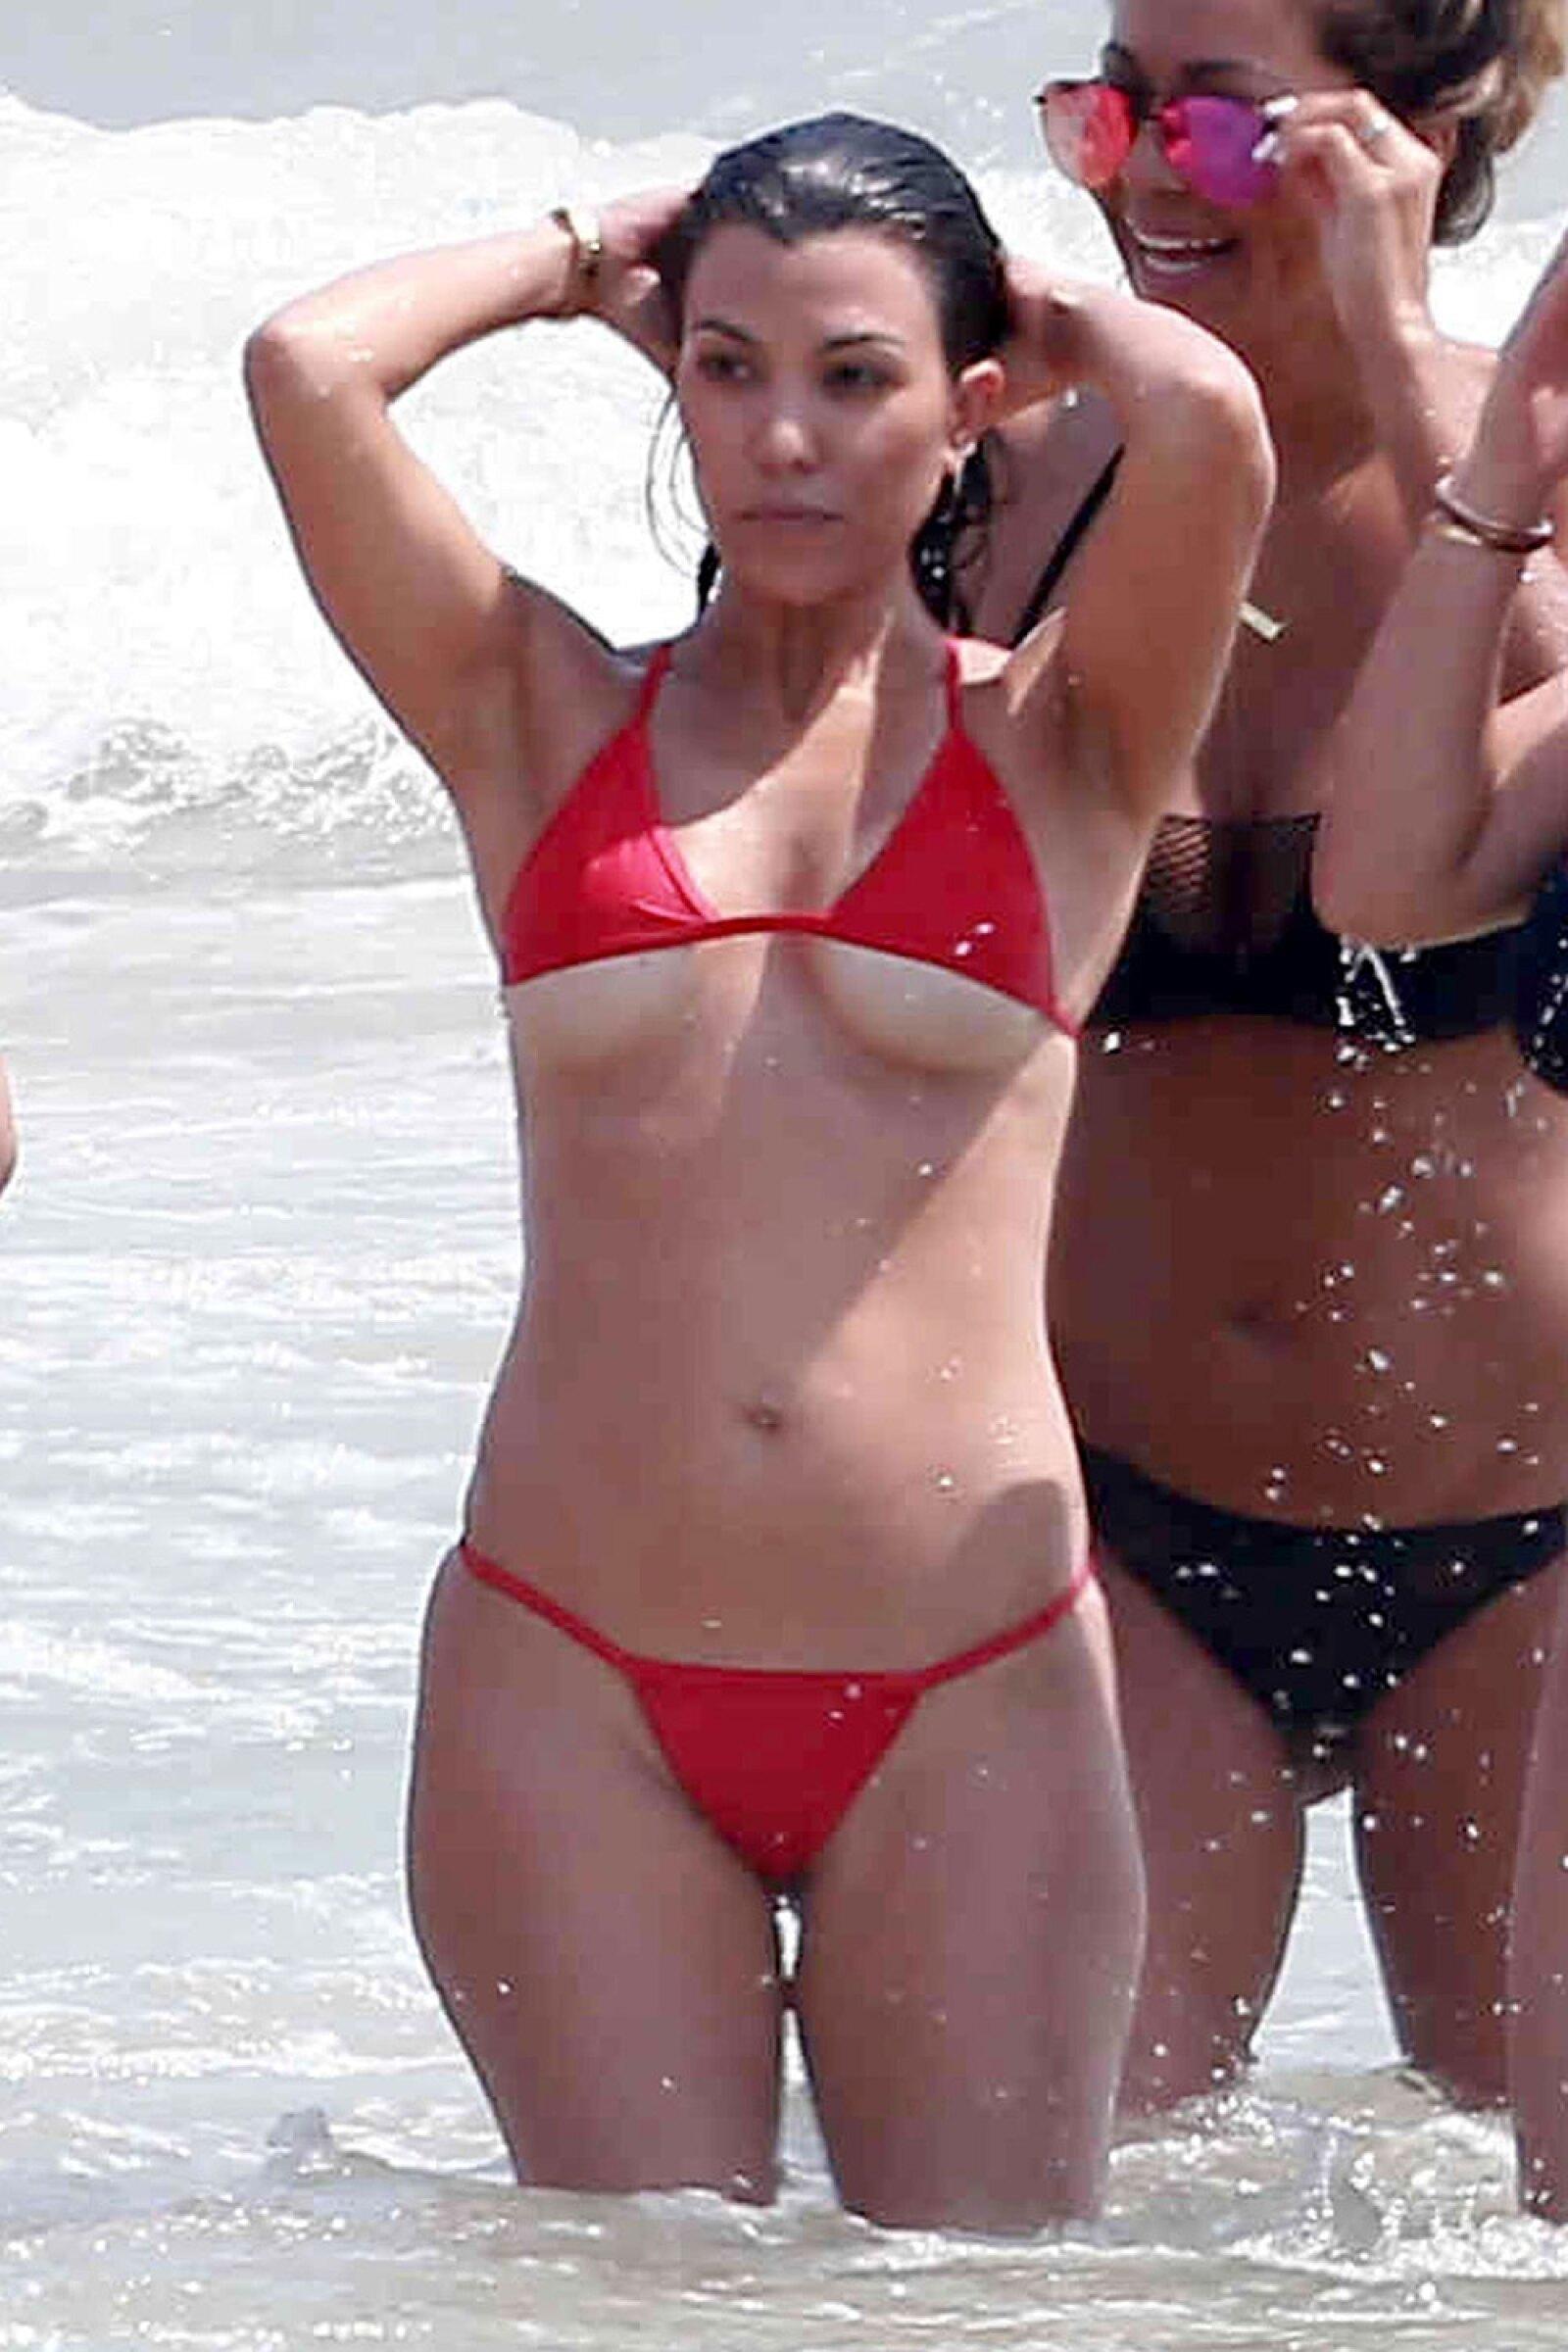 amateur-bikini-malfunction-lincoln-nebraska